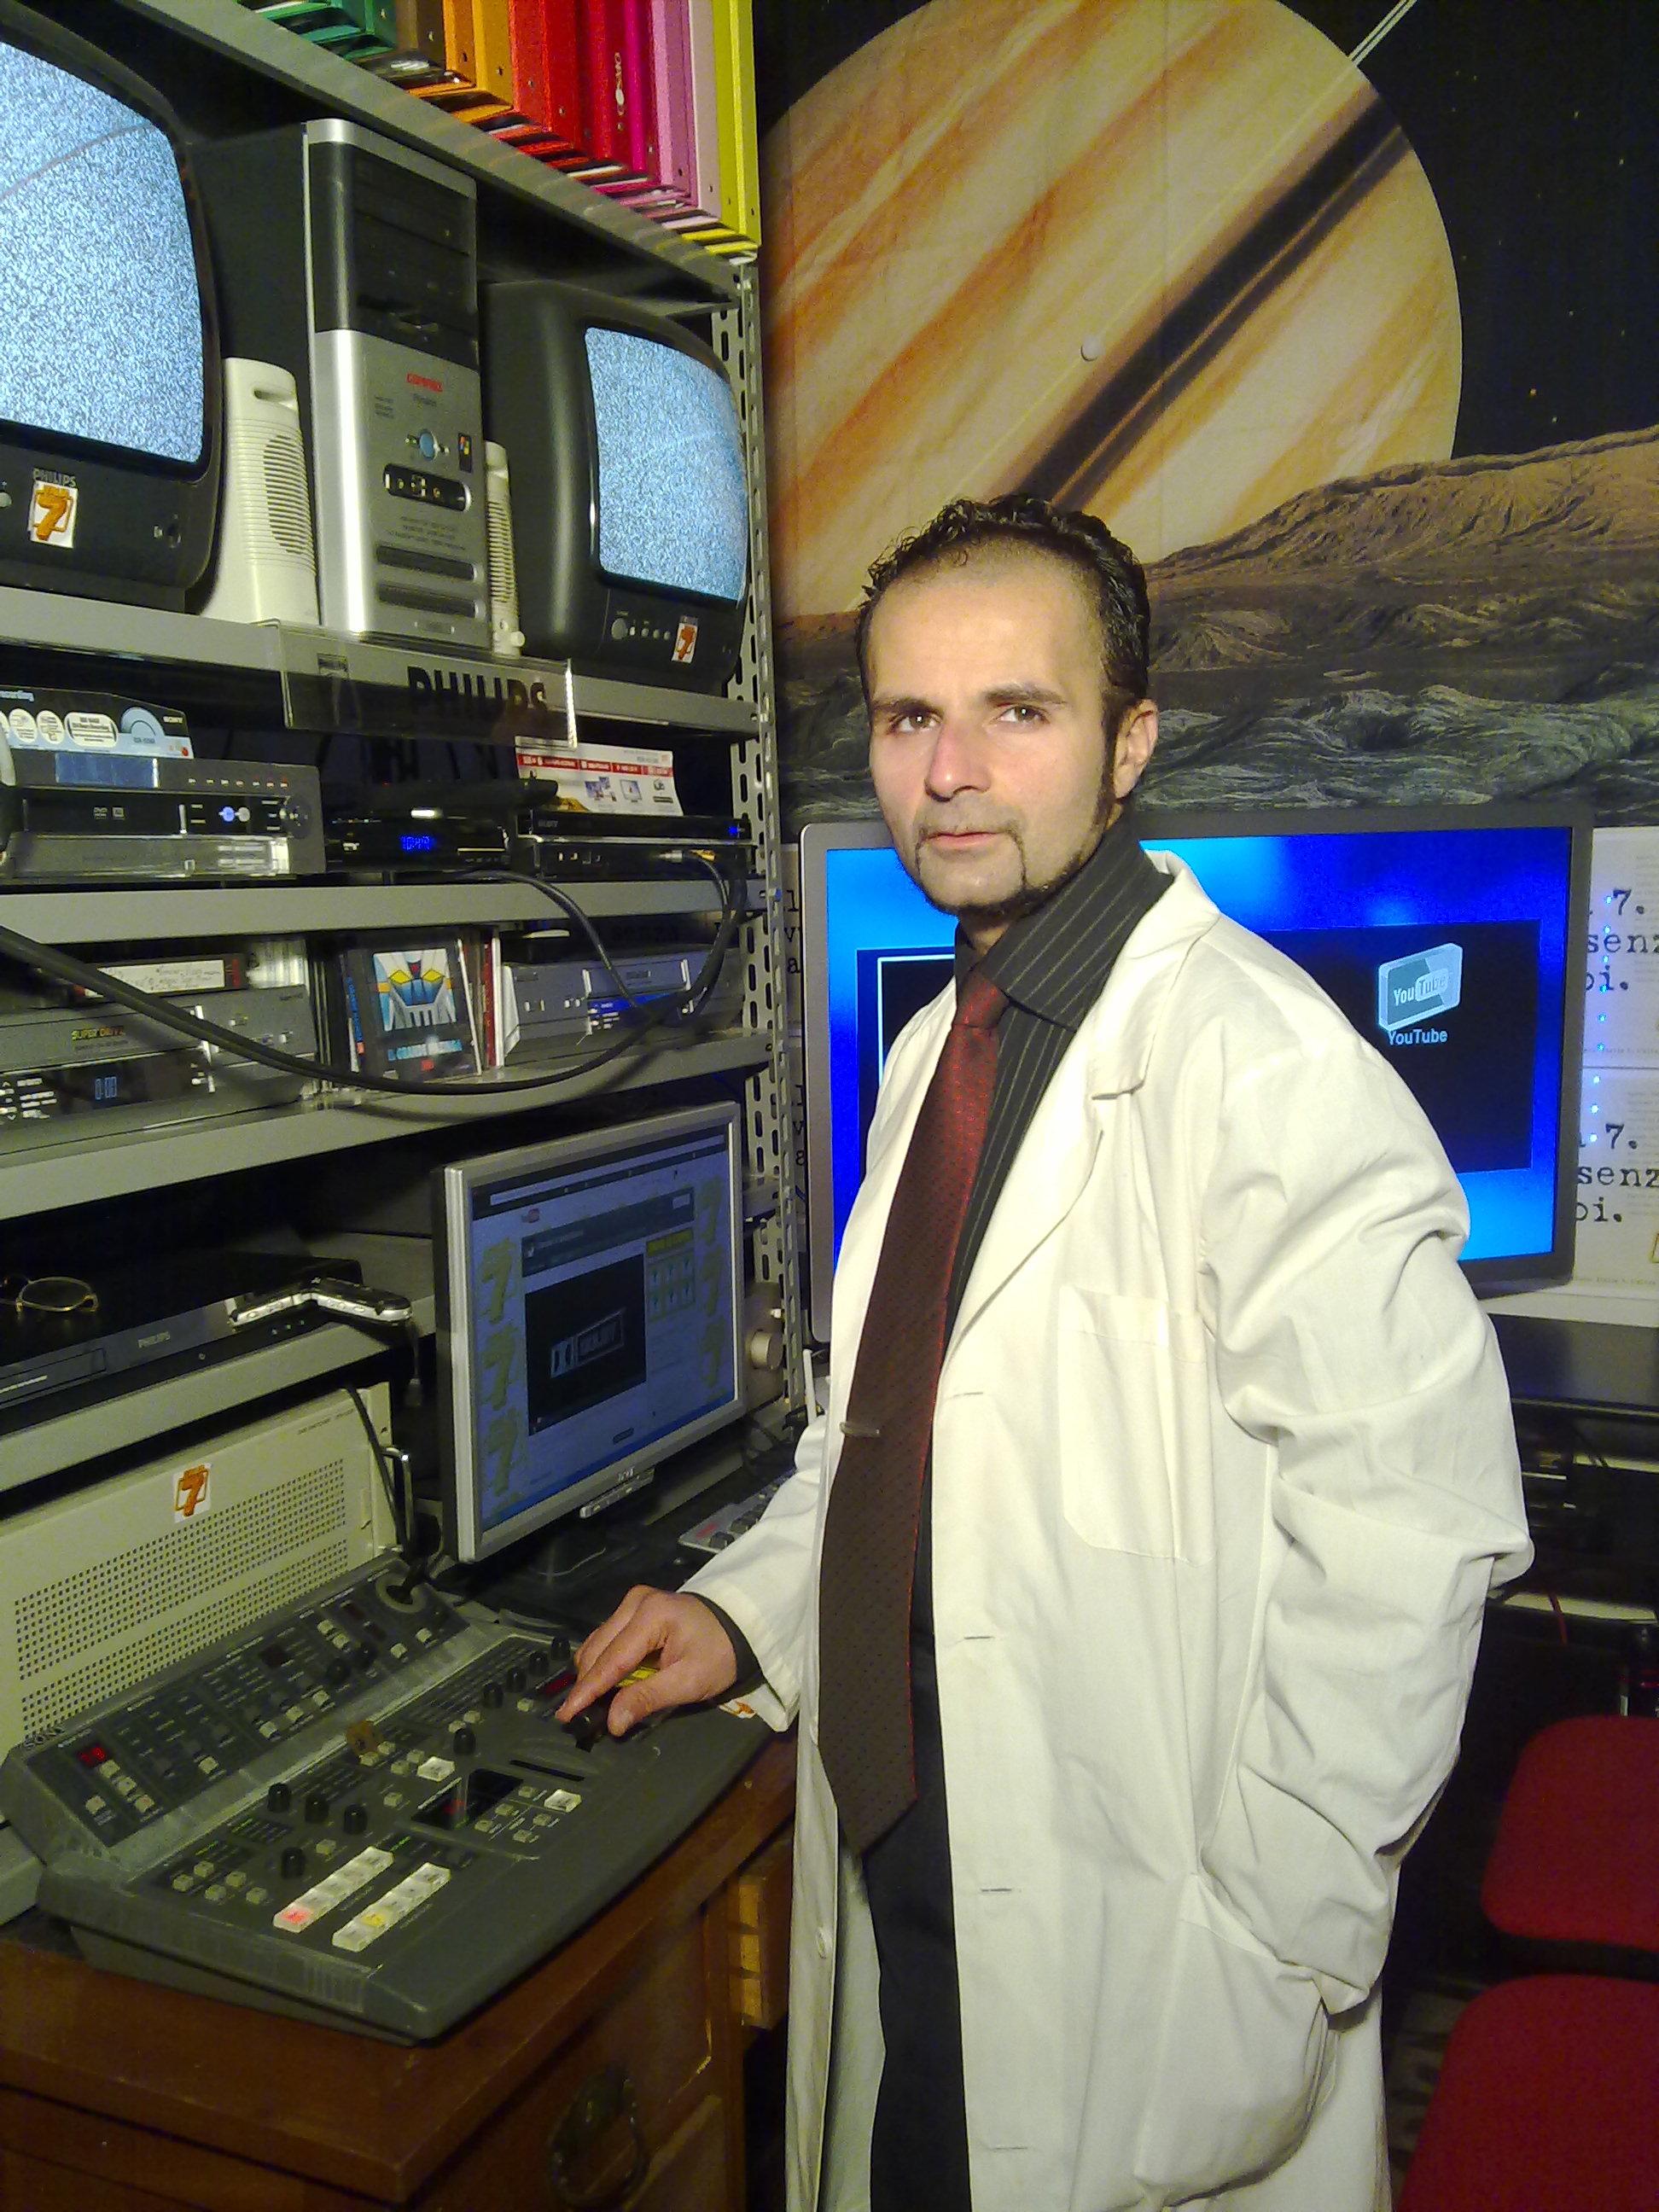 SEBY MIDOLO REGIA TELEVISIVA BROADCAST